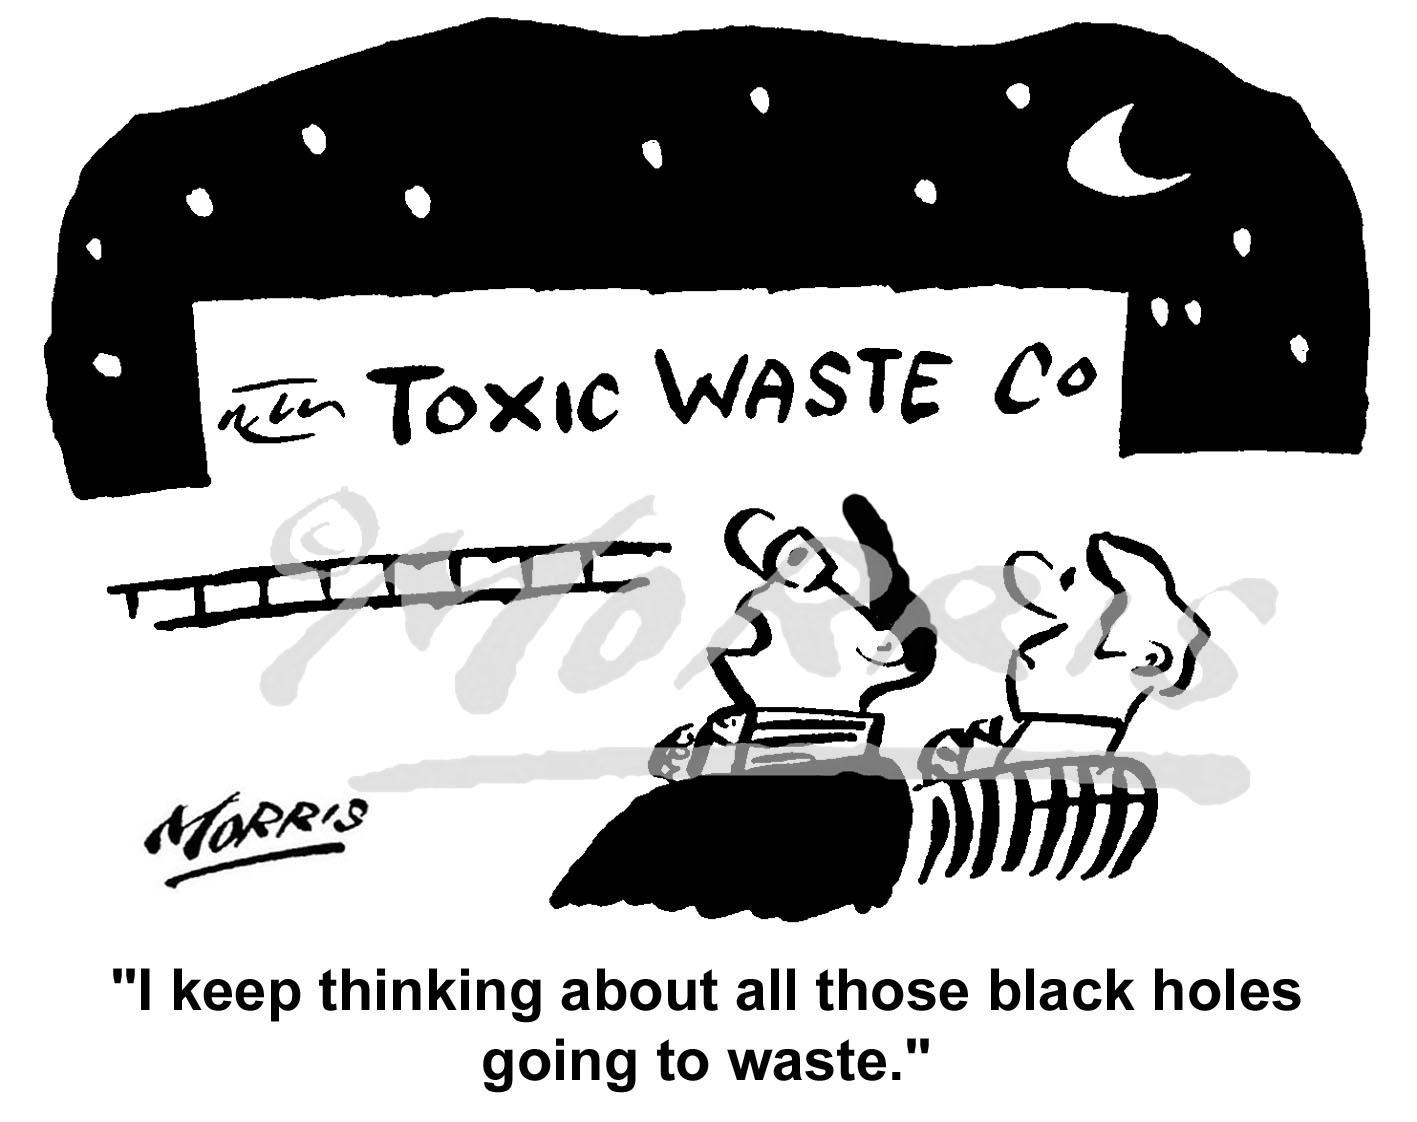 Toxic waste cartoon – Ref: 1204bw